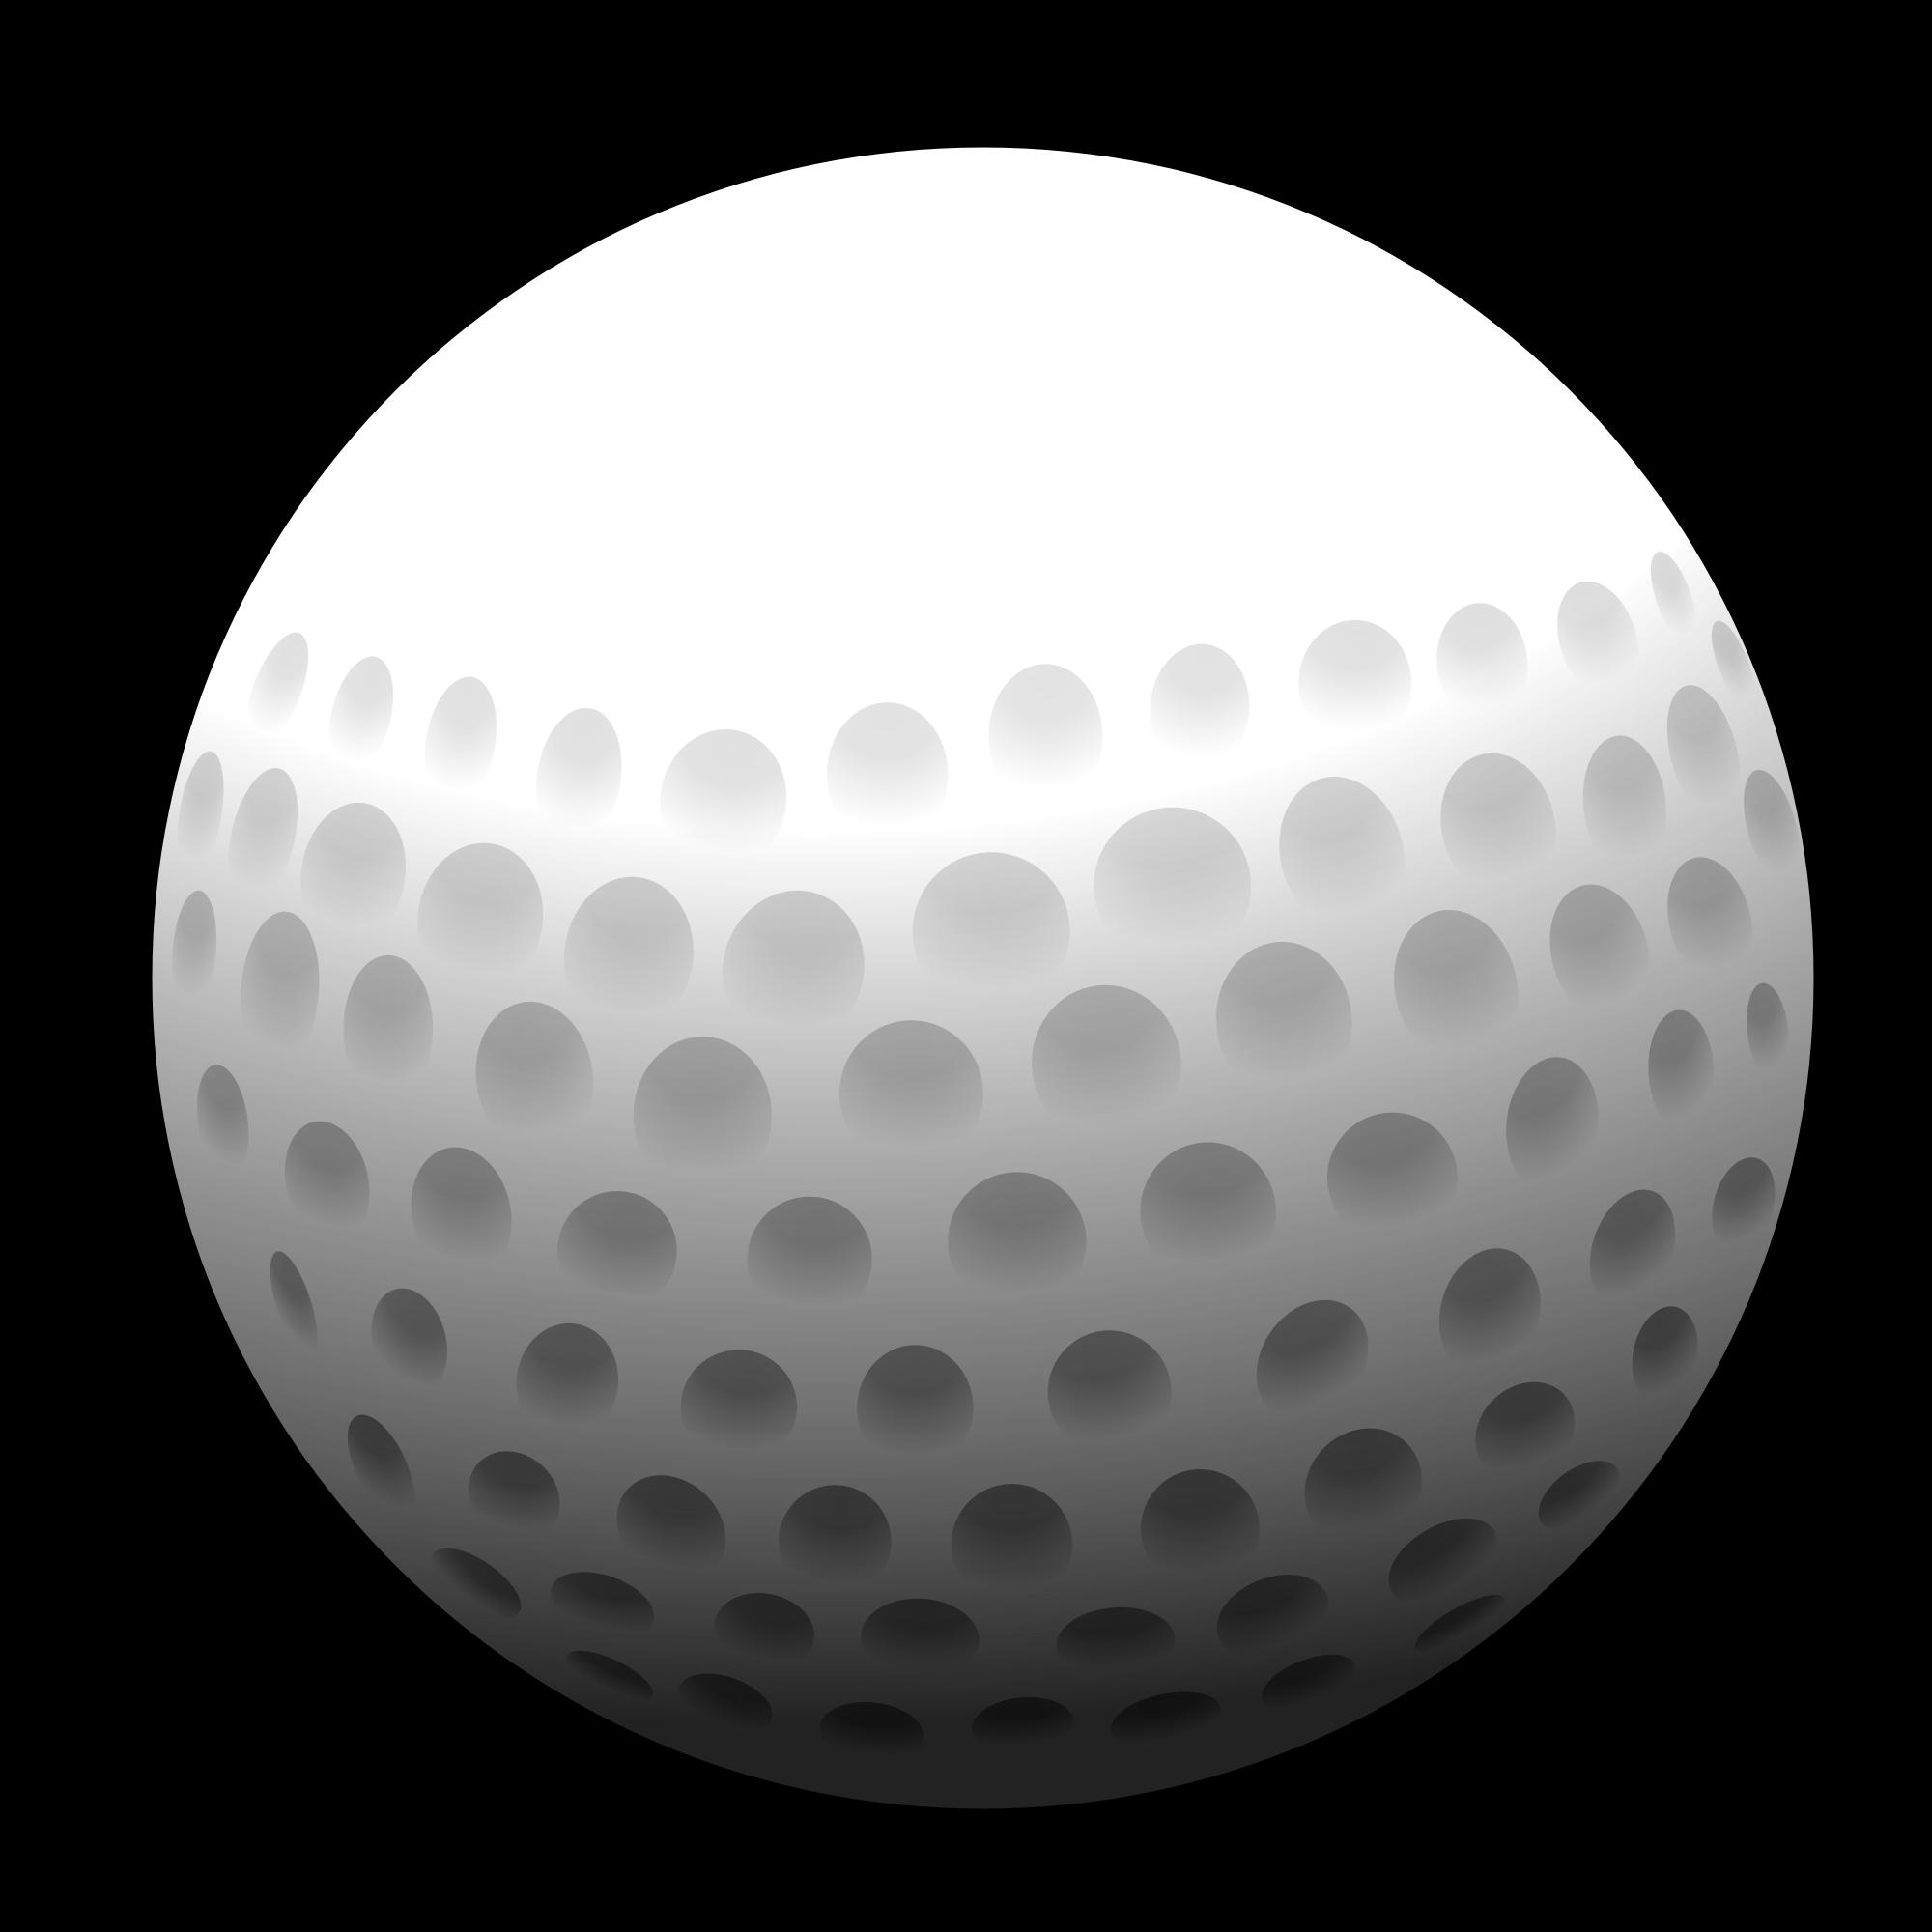 png golf ball transparent golf ball png images pluspng rh pluspng com golf ball on tee graphic golf ball graphics free